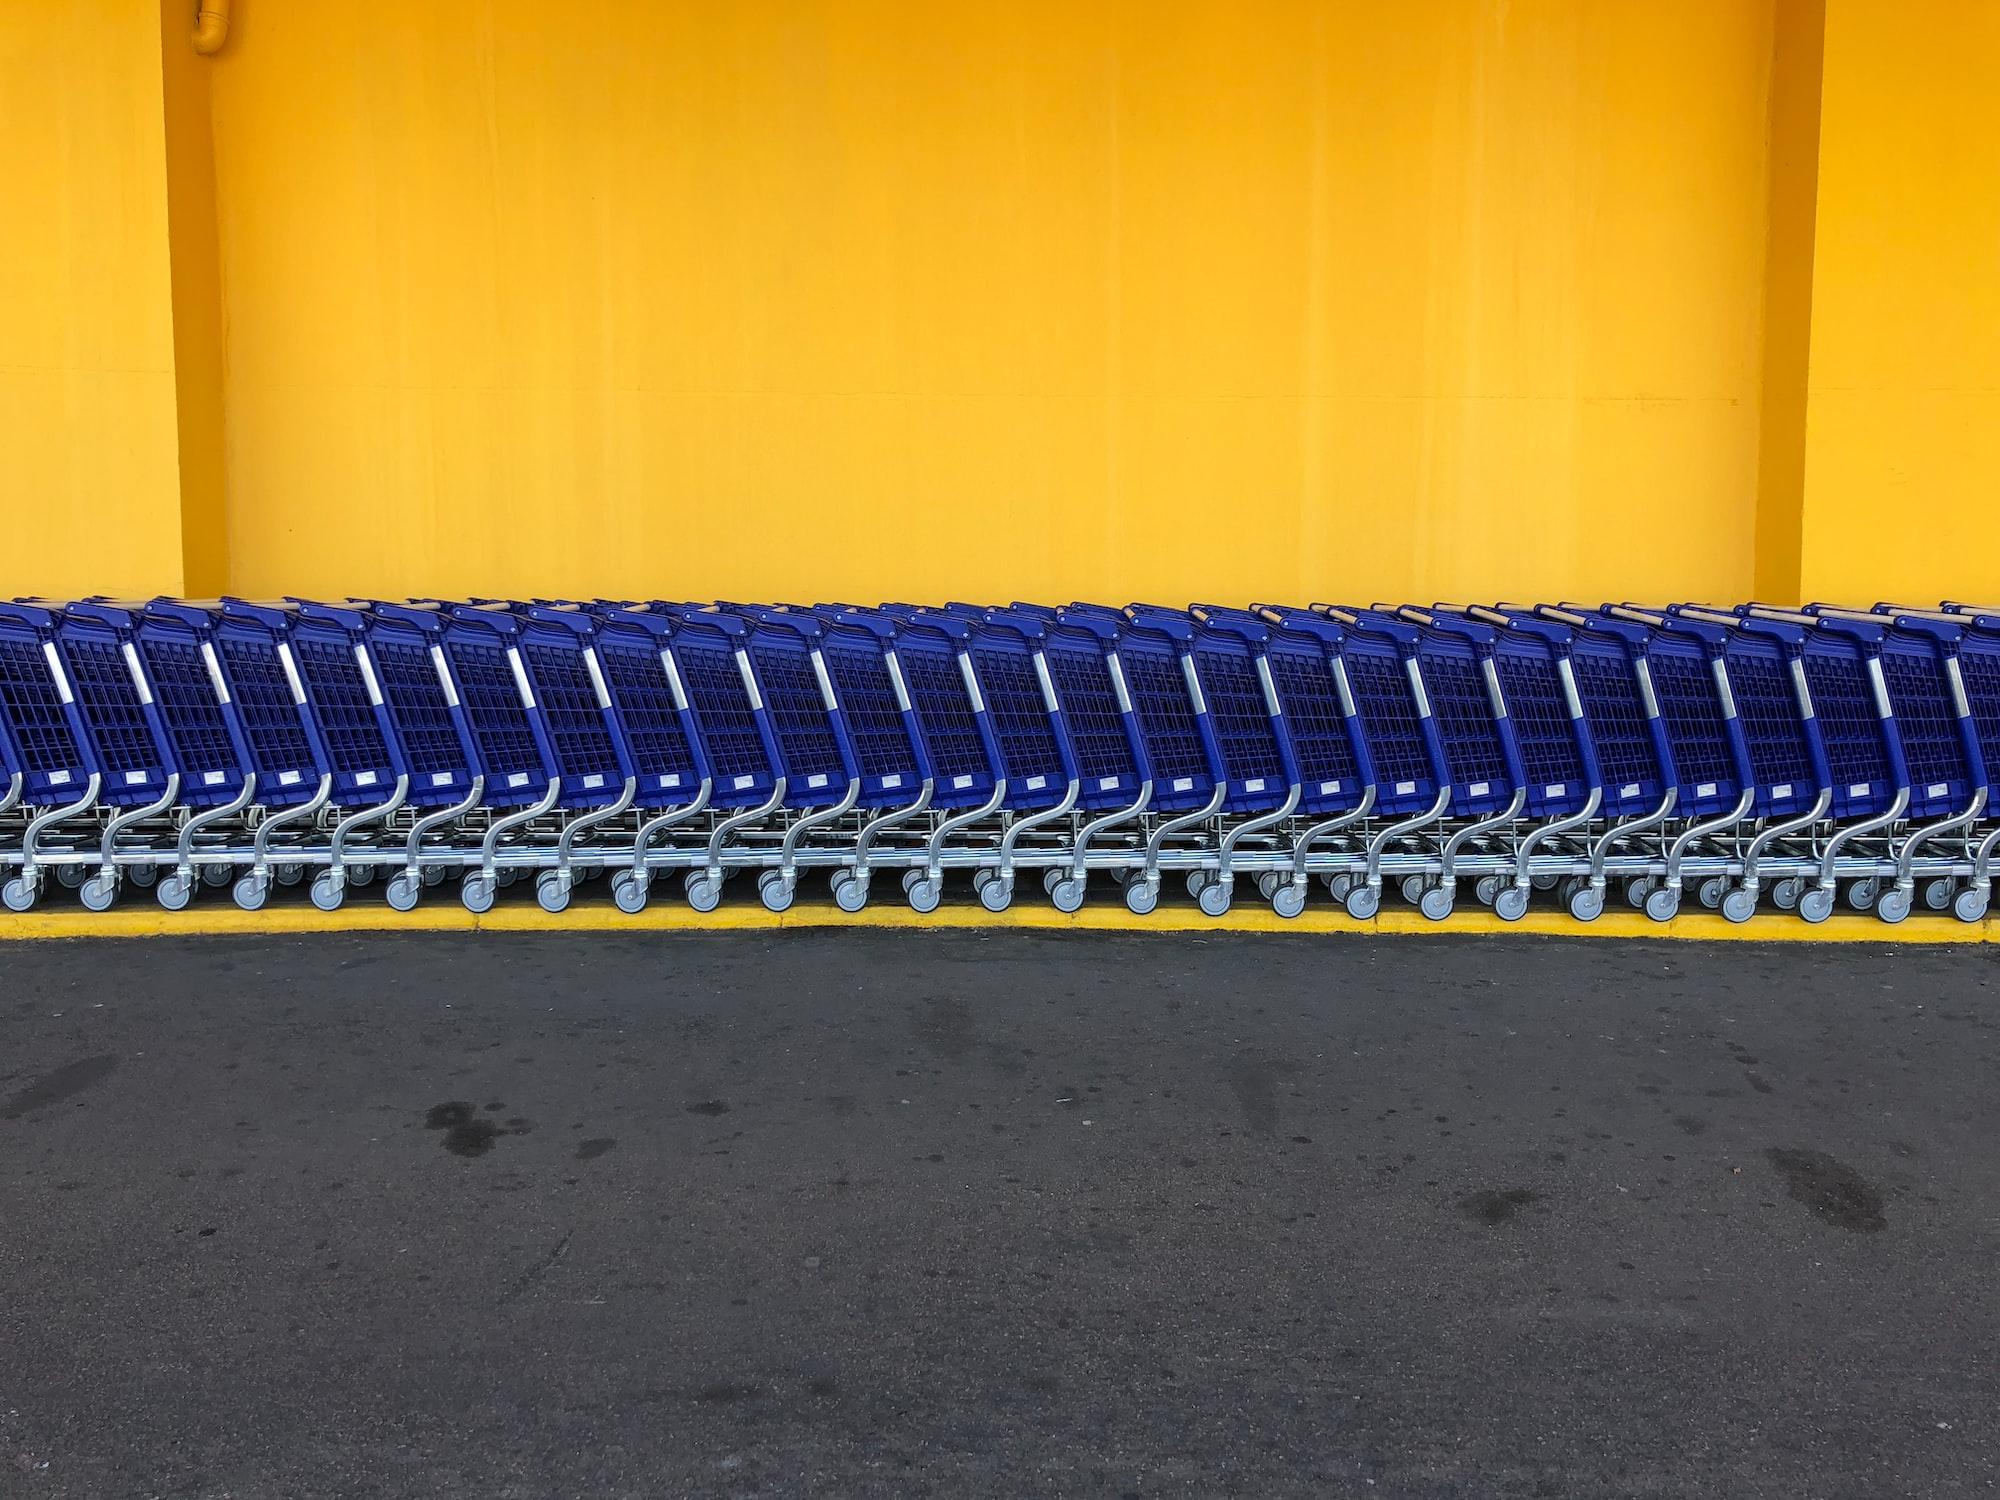 Wal-Mart... Amigo o Enemigo?